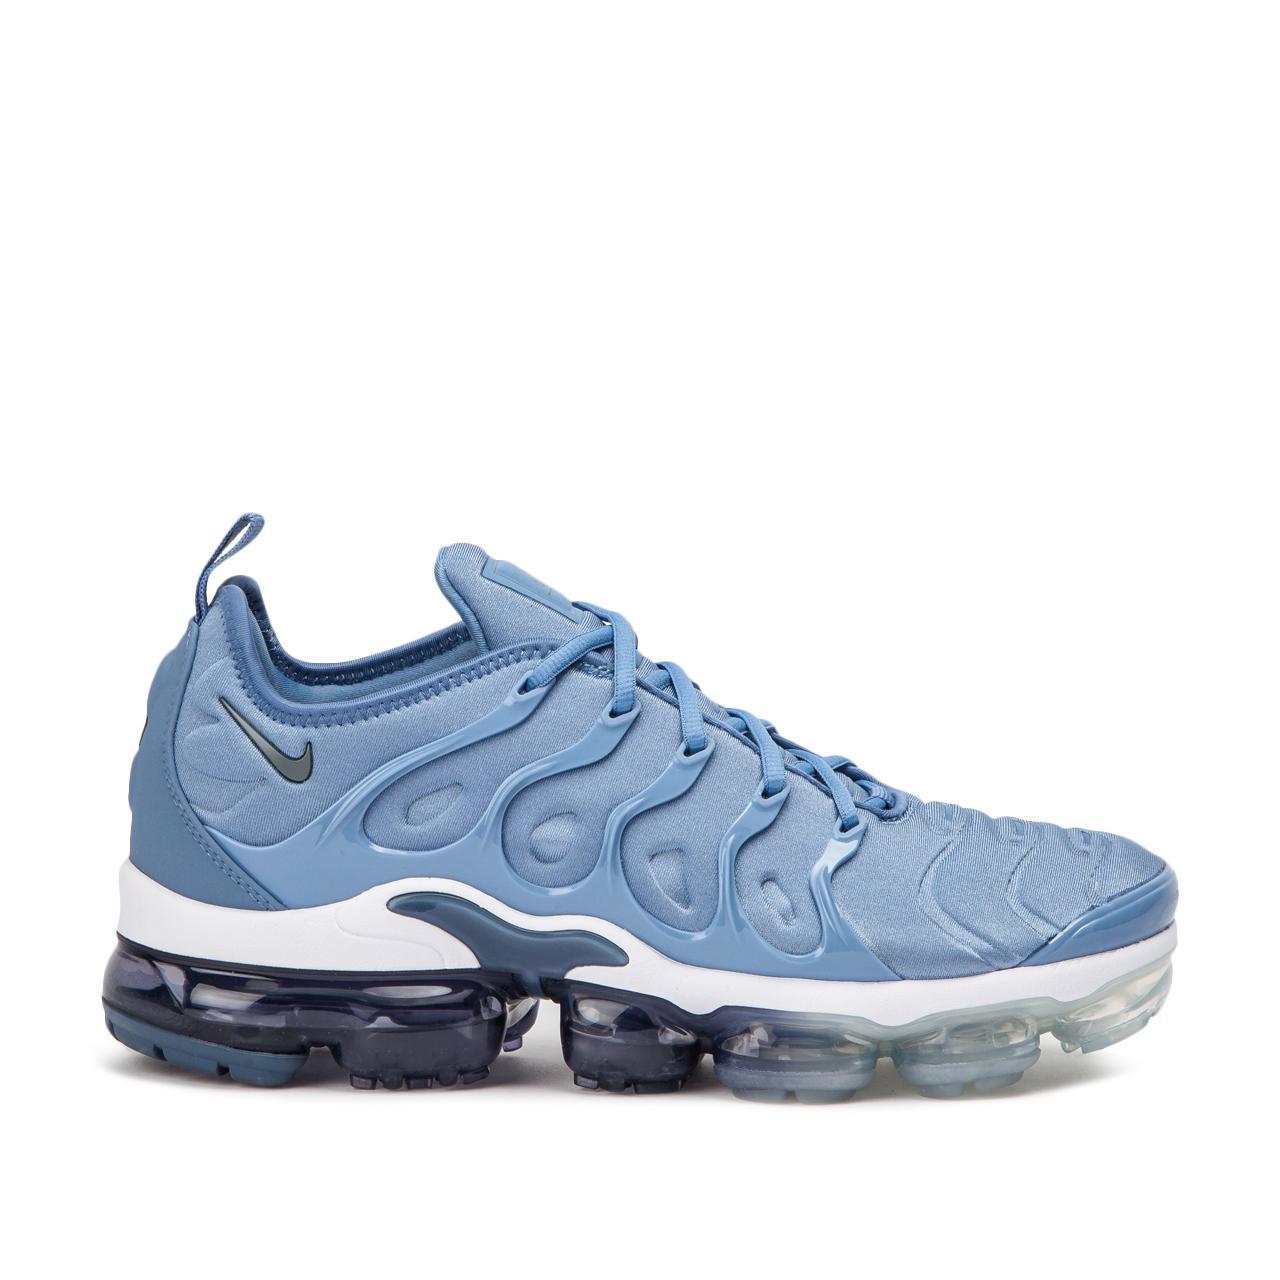 77da07c8d721 Lyst - Nike Nike Air Vapormax Plus in Blue for Men - Save 50%